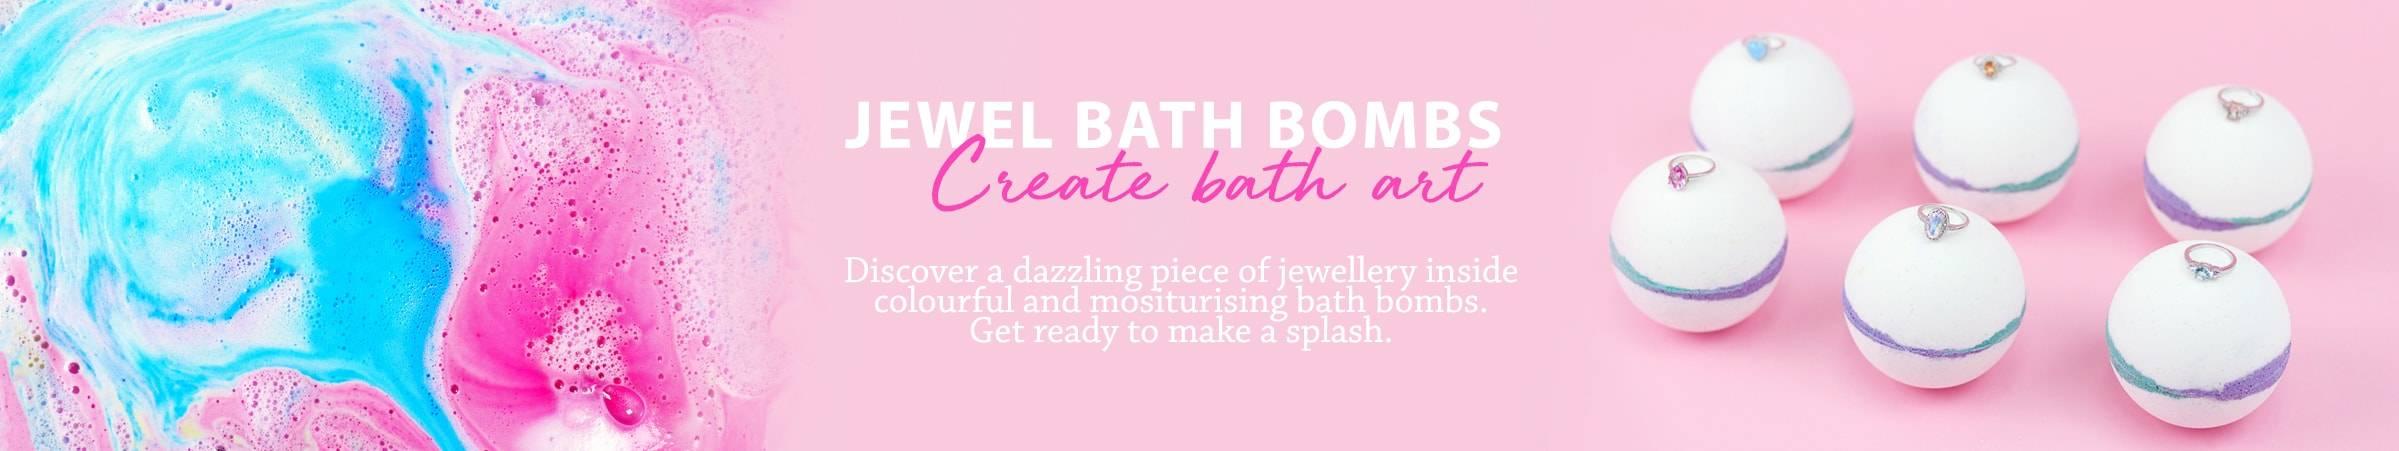 Jewel Bath Bomb